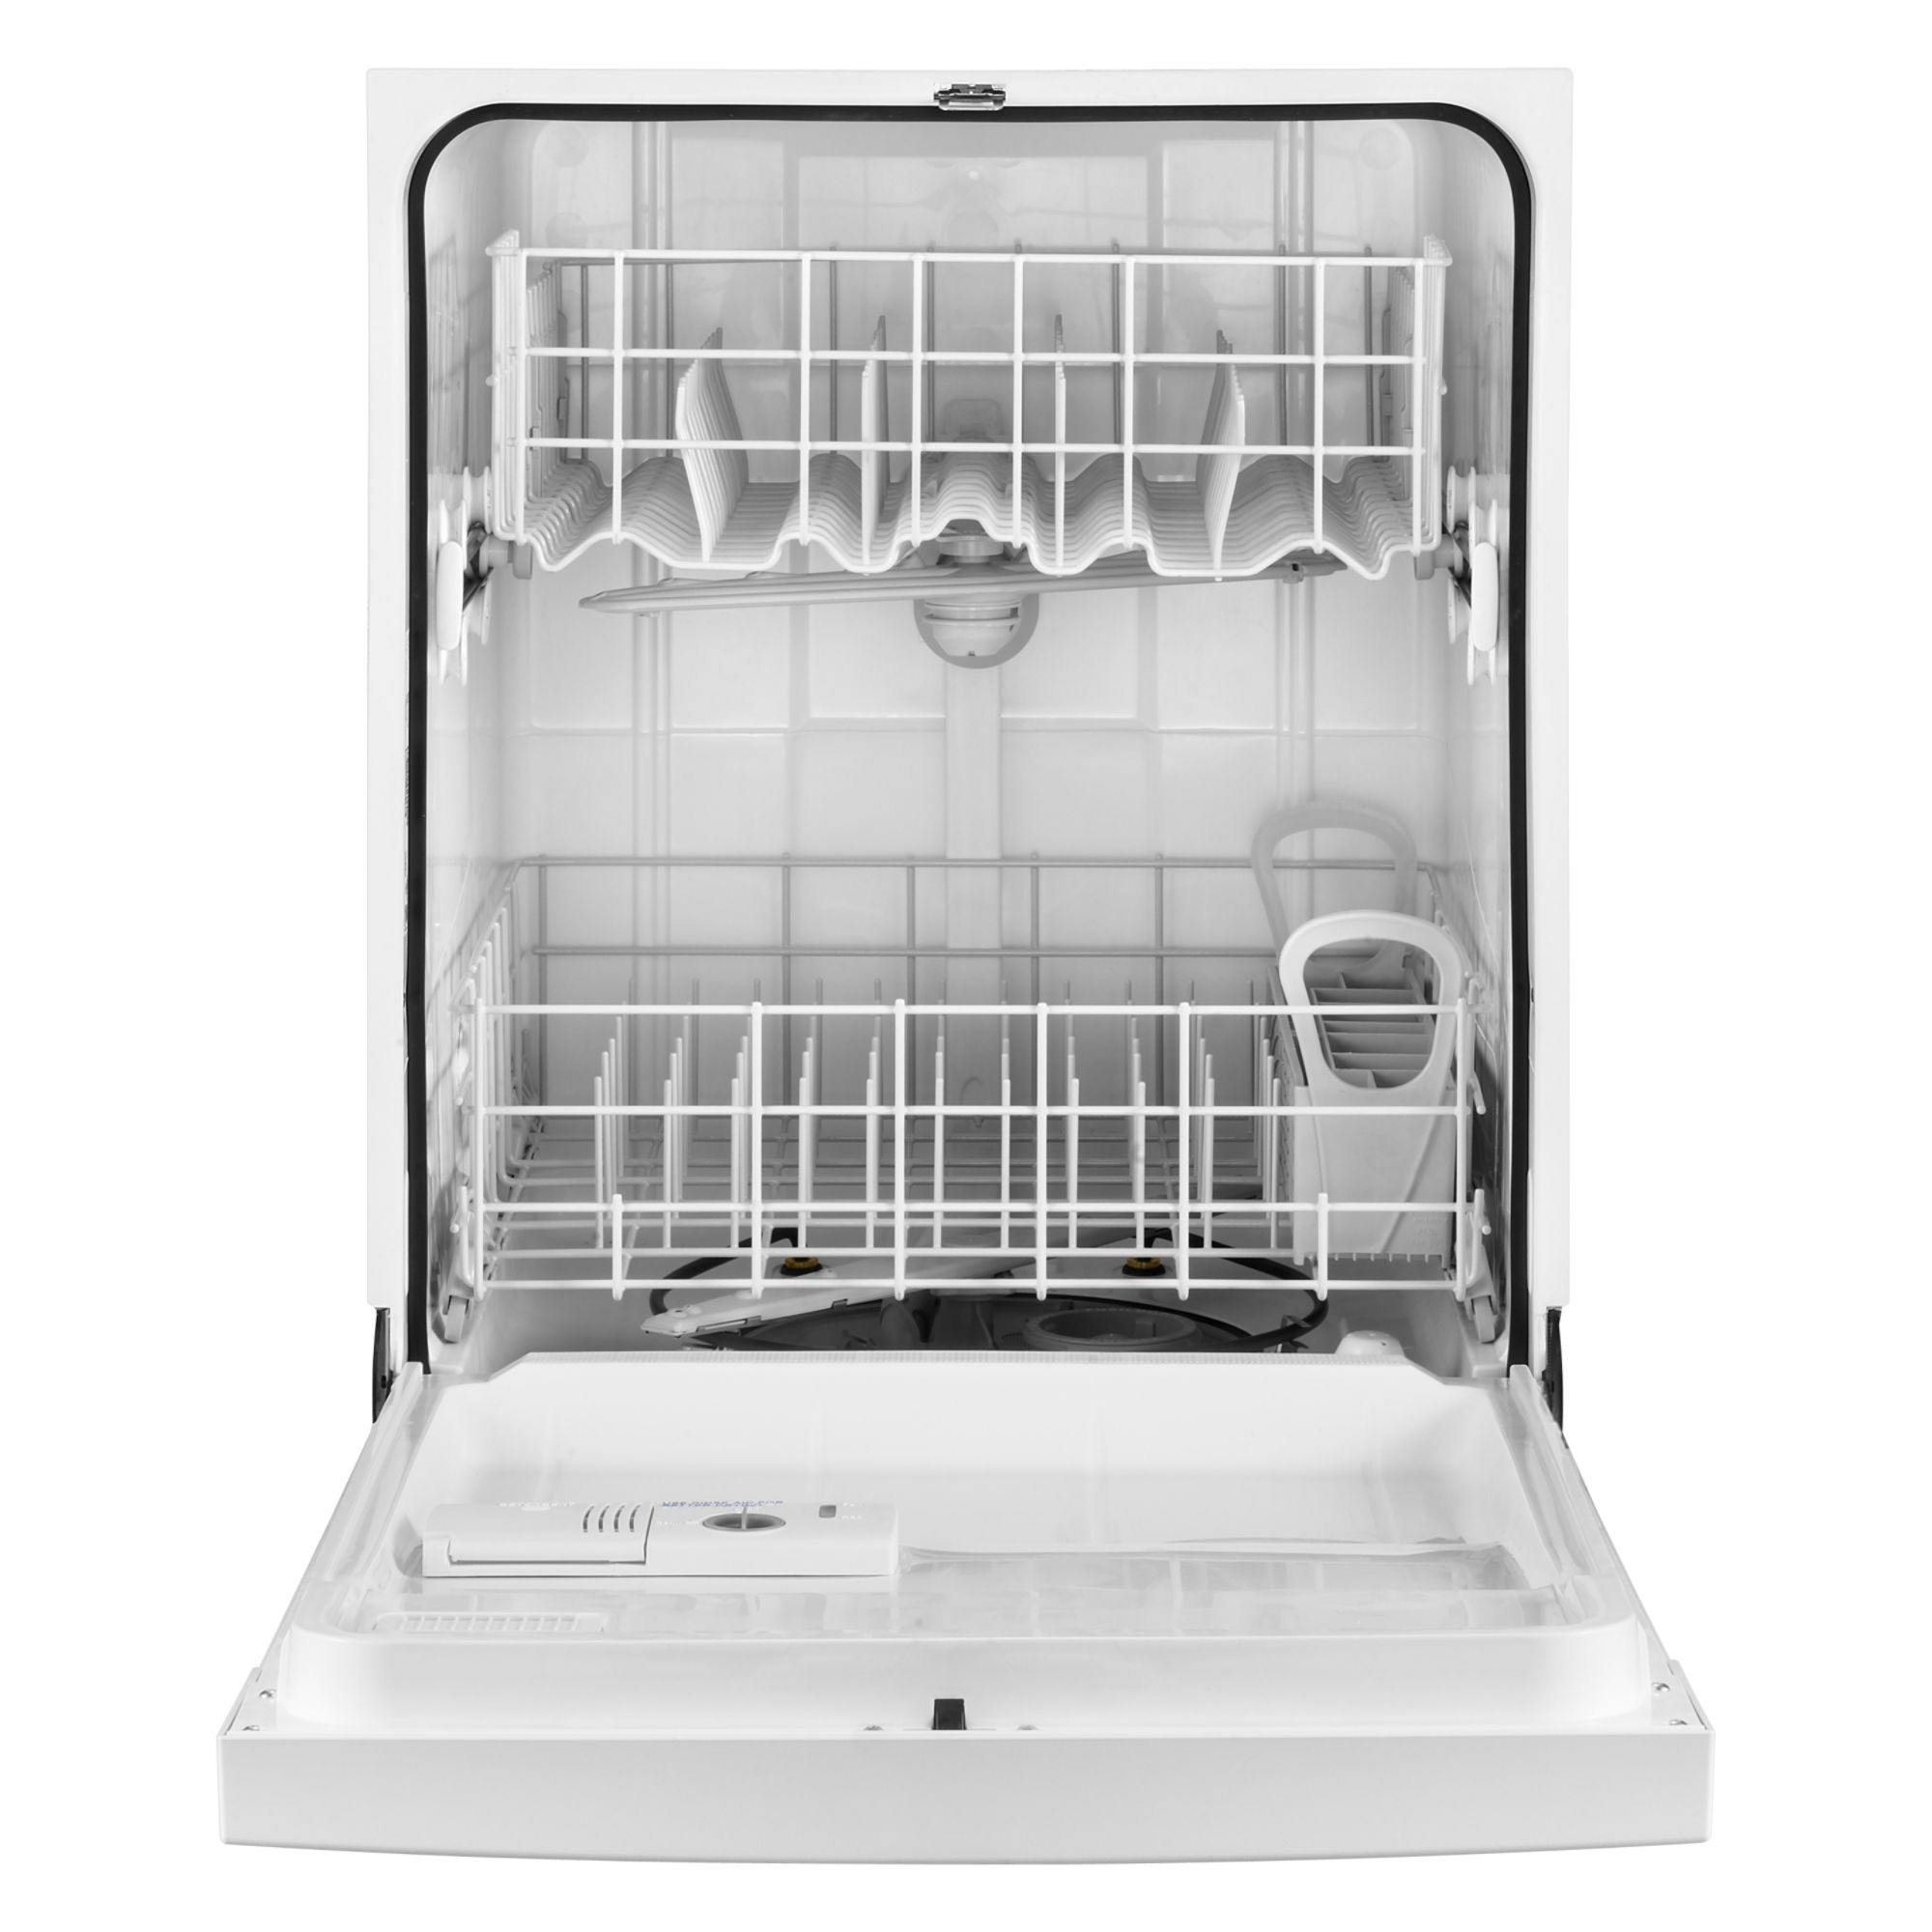 "Whirlpool 24"" Built-In Dishwasher w/ Resource-Efficient Wash System - White"